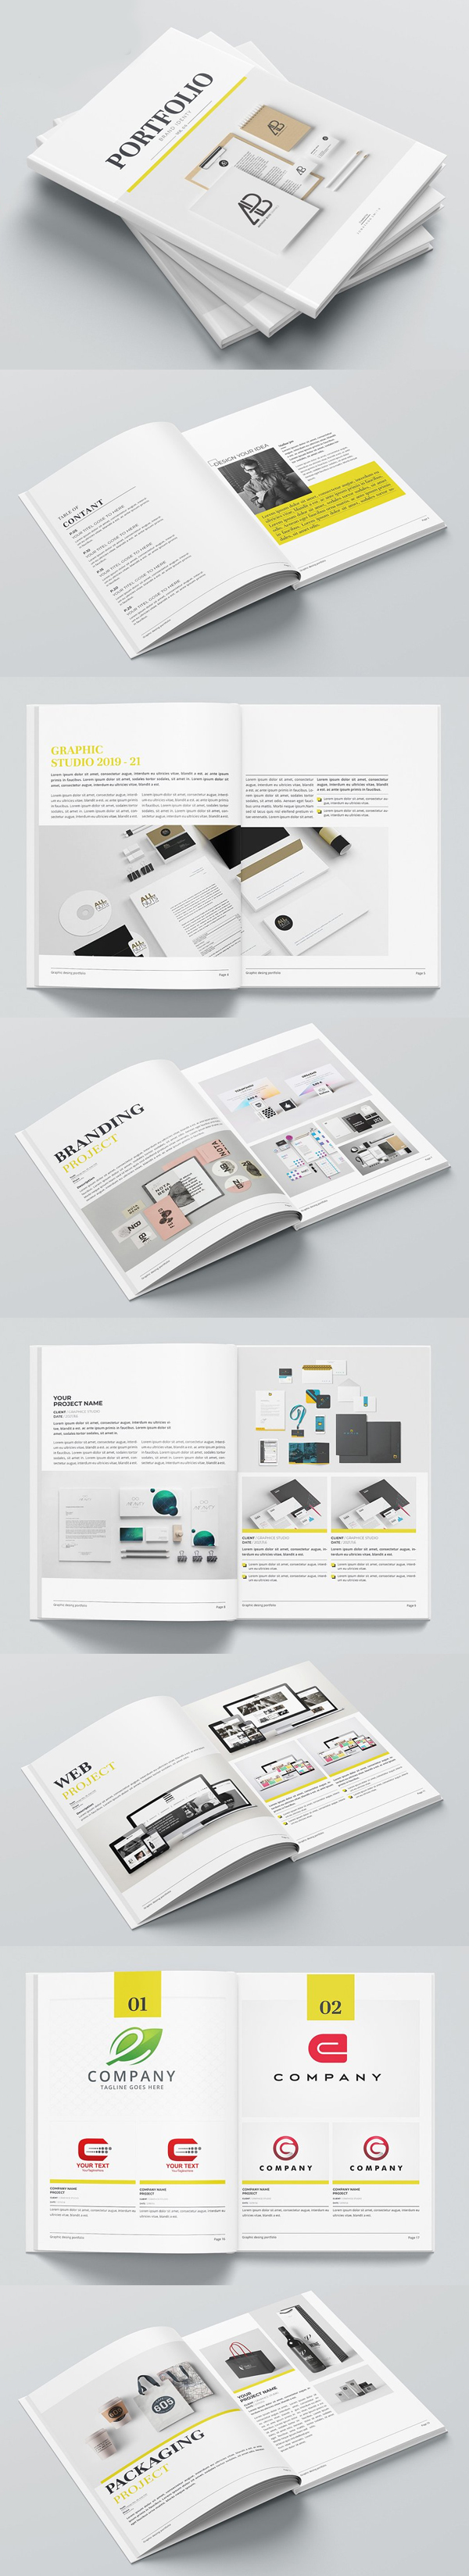 Minimal Brochure / Catalogs Template